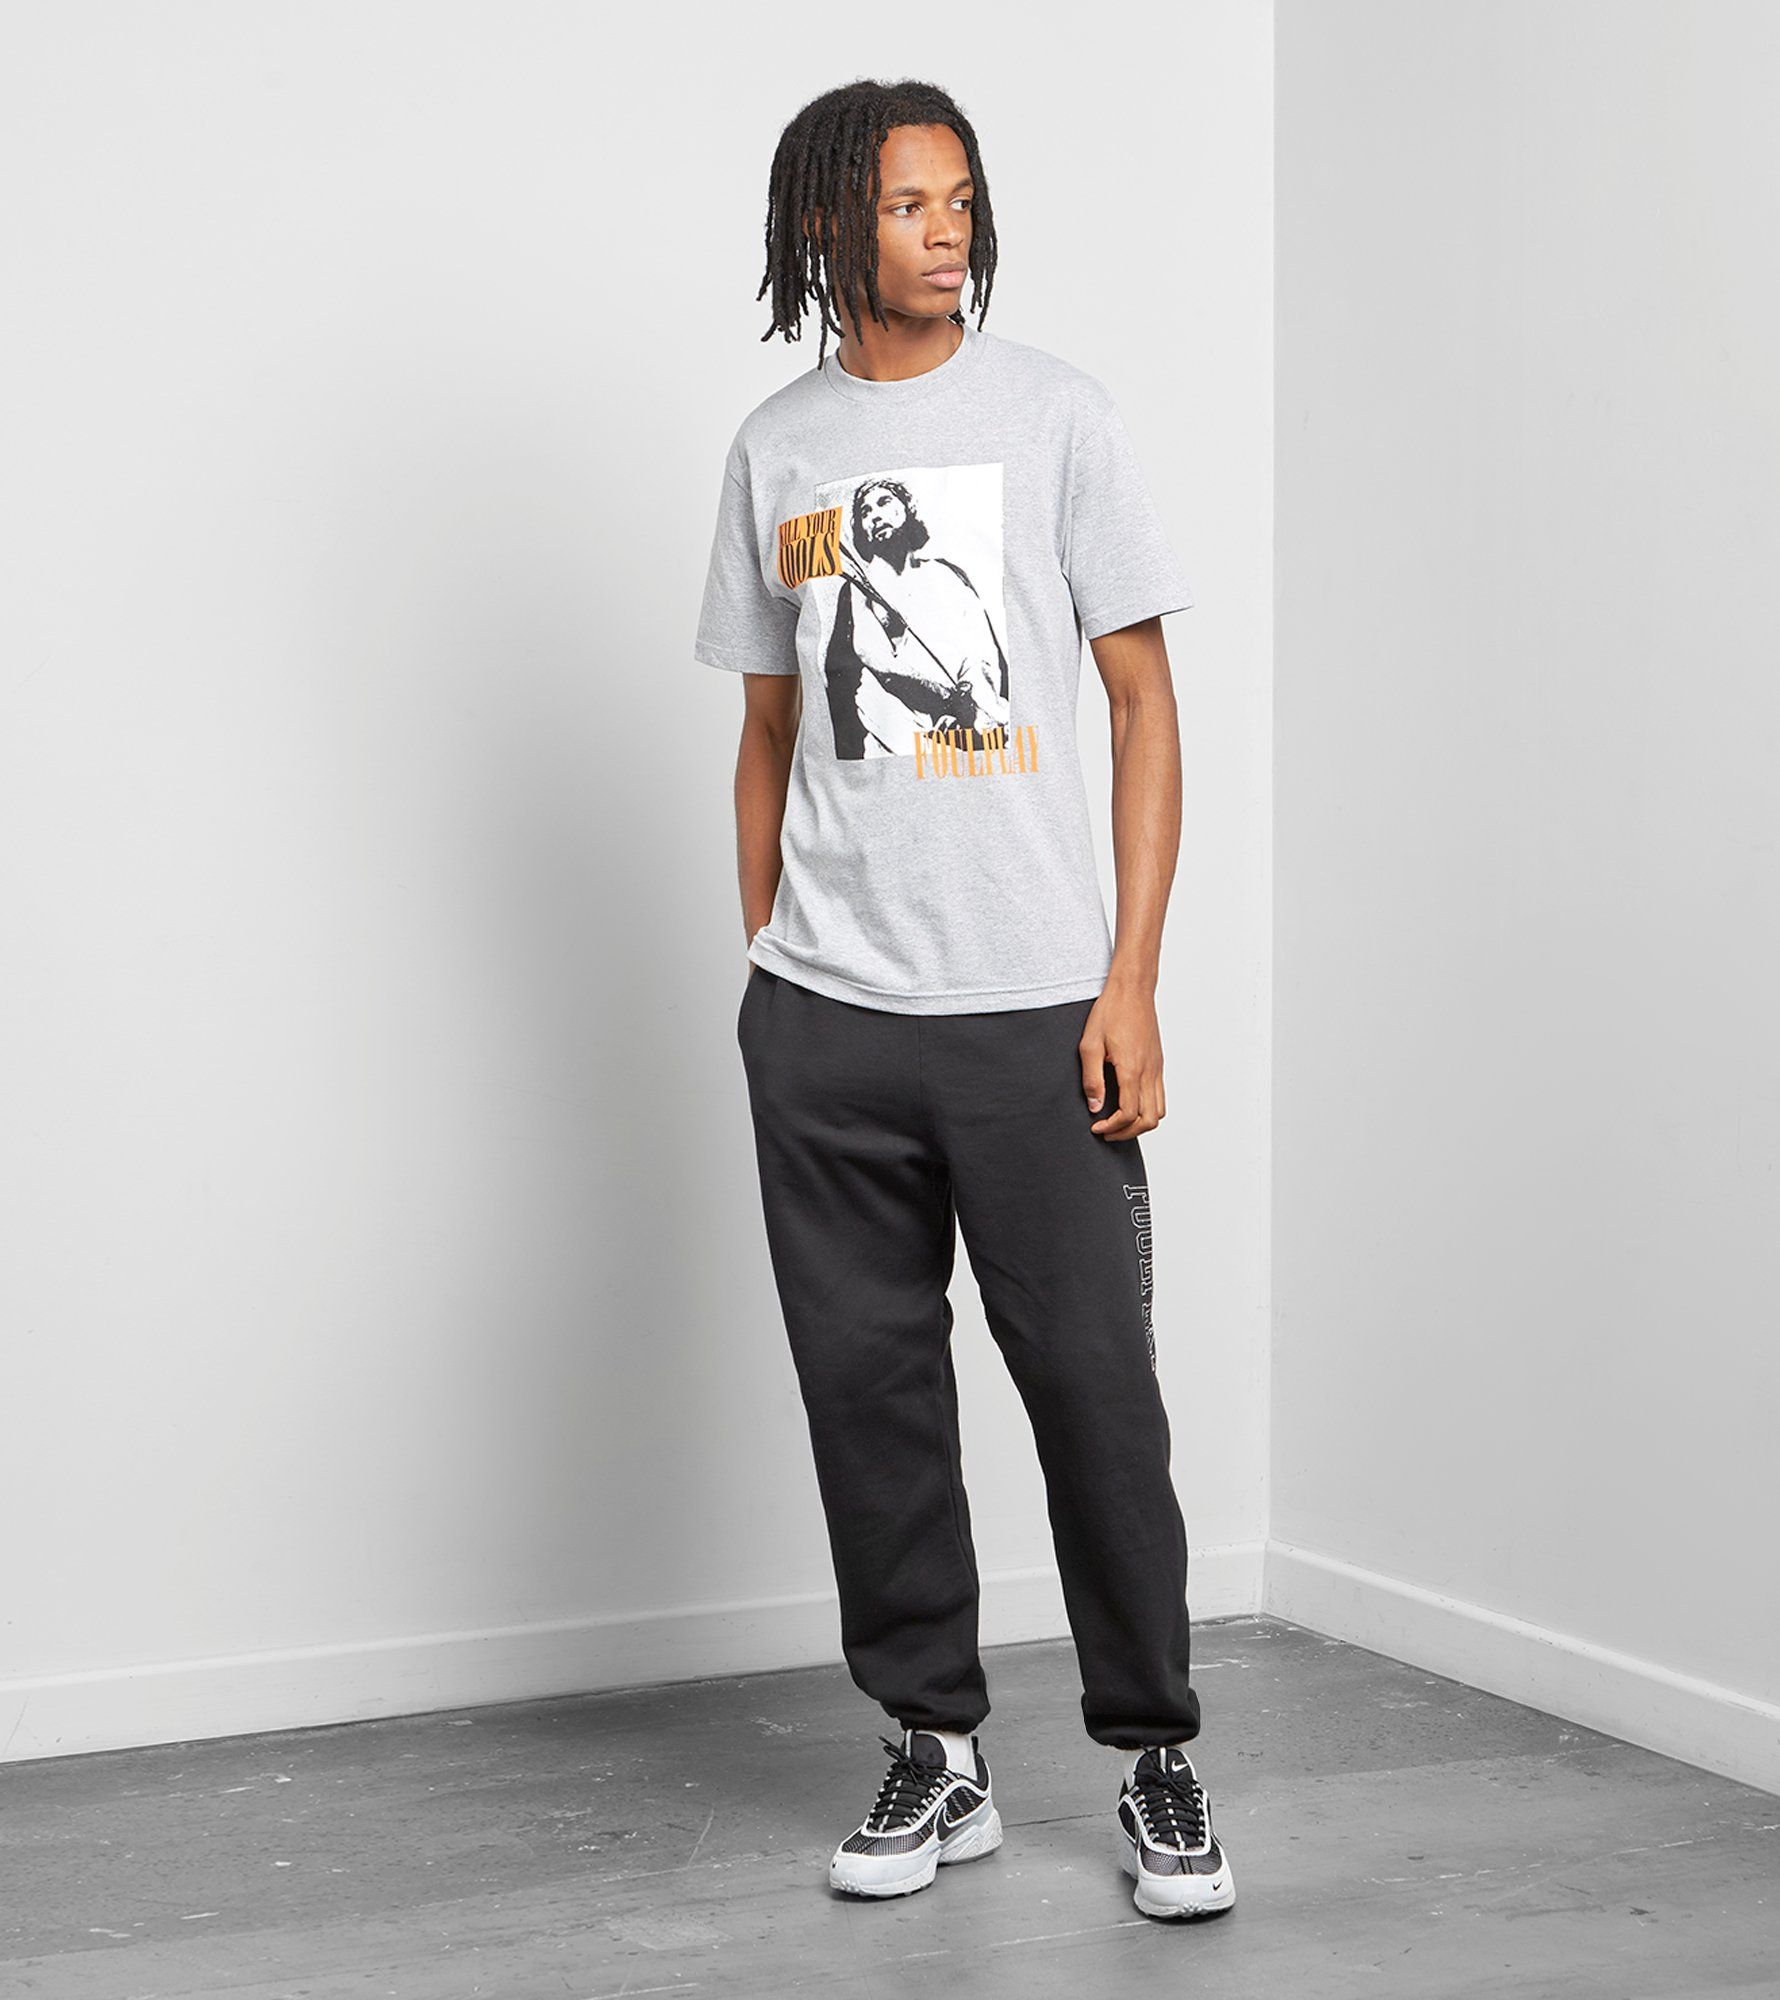 Foulplay Kill Your Idols T-Shirt